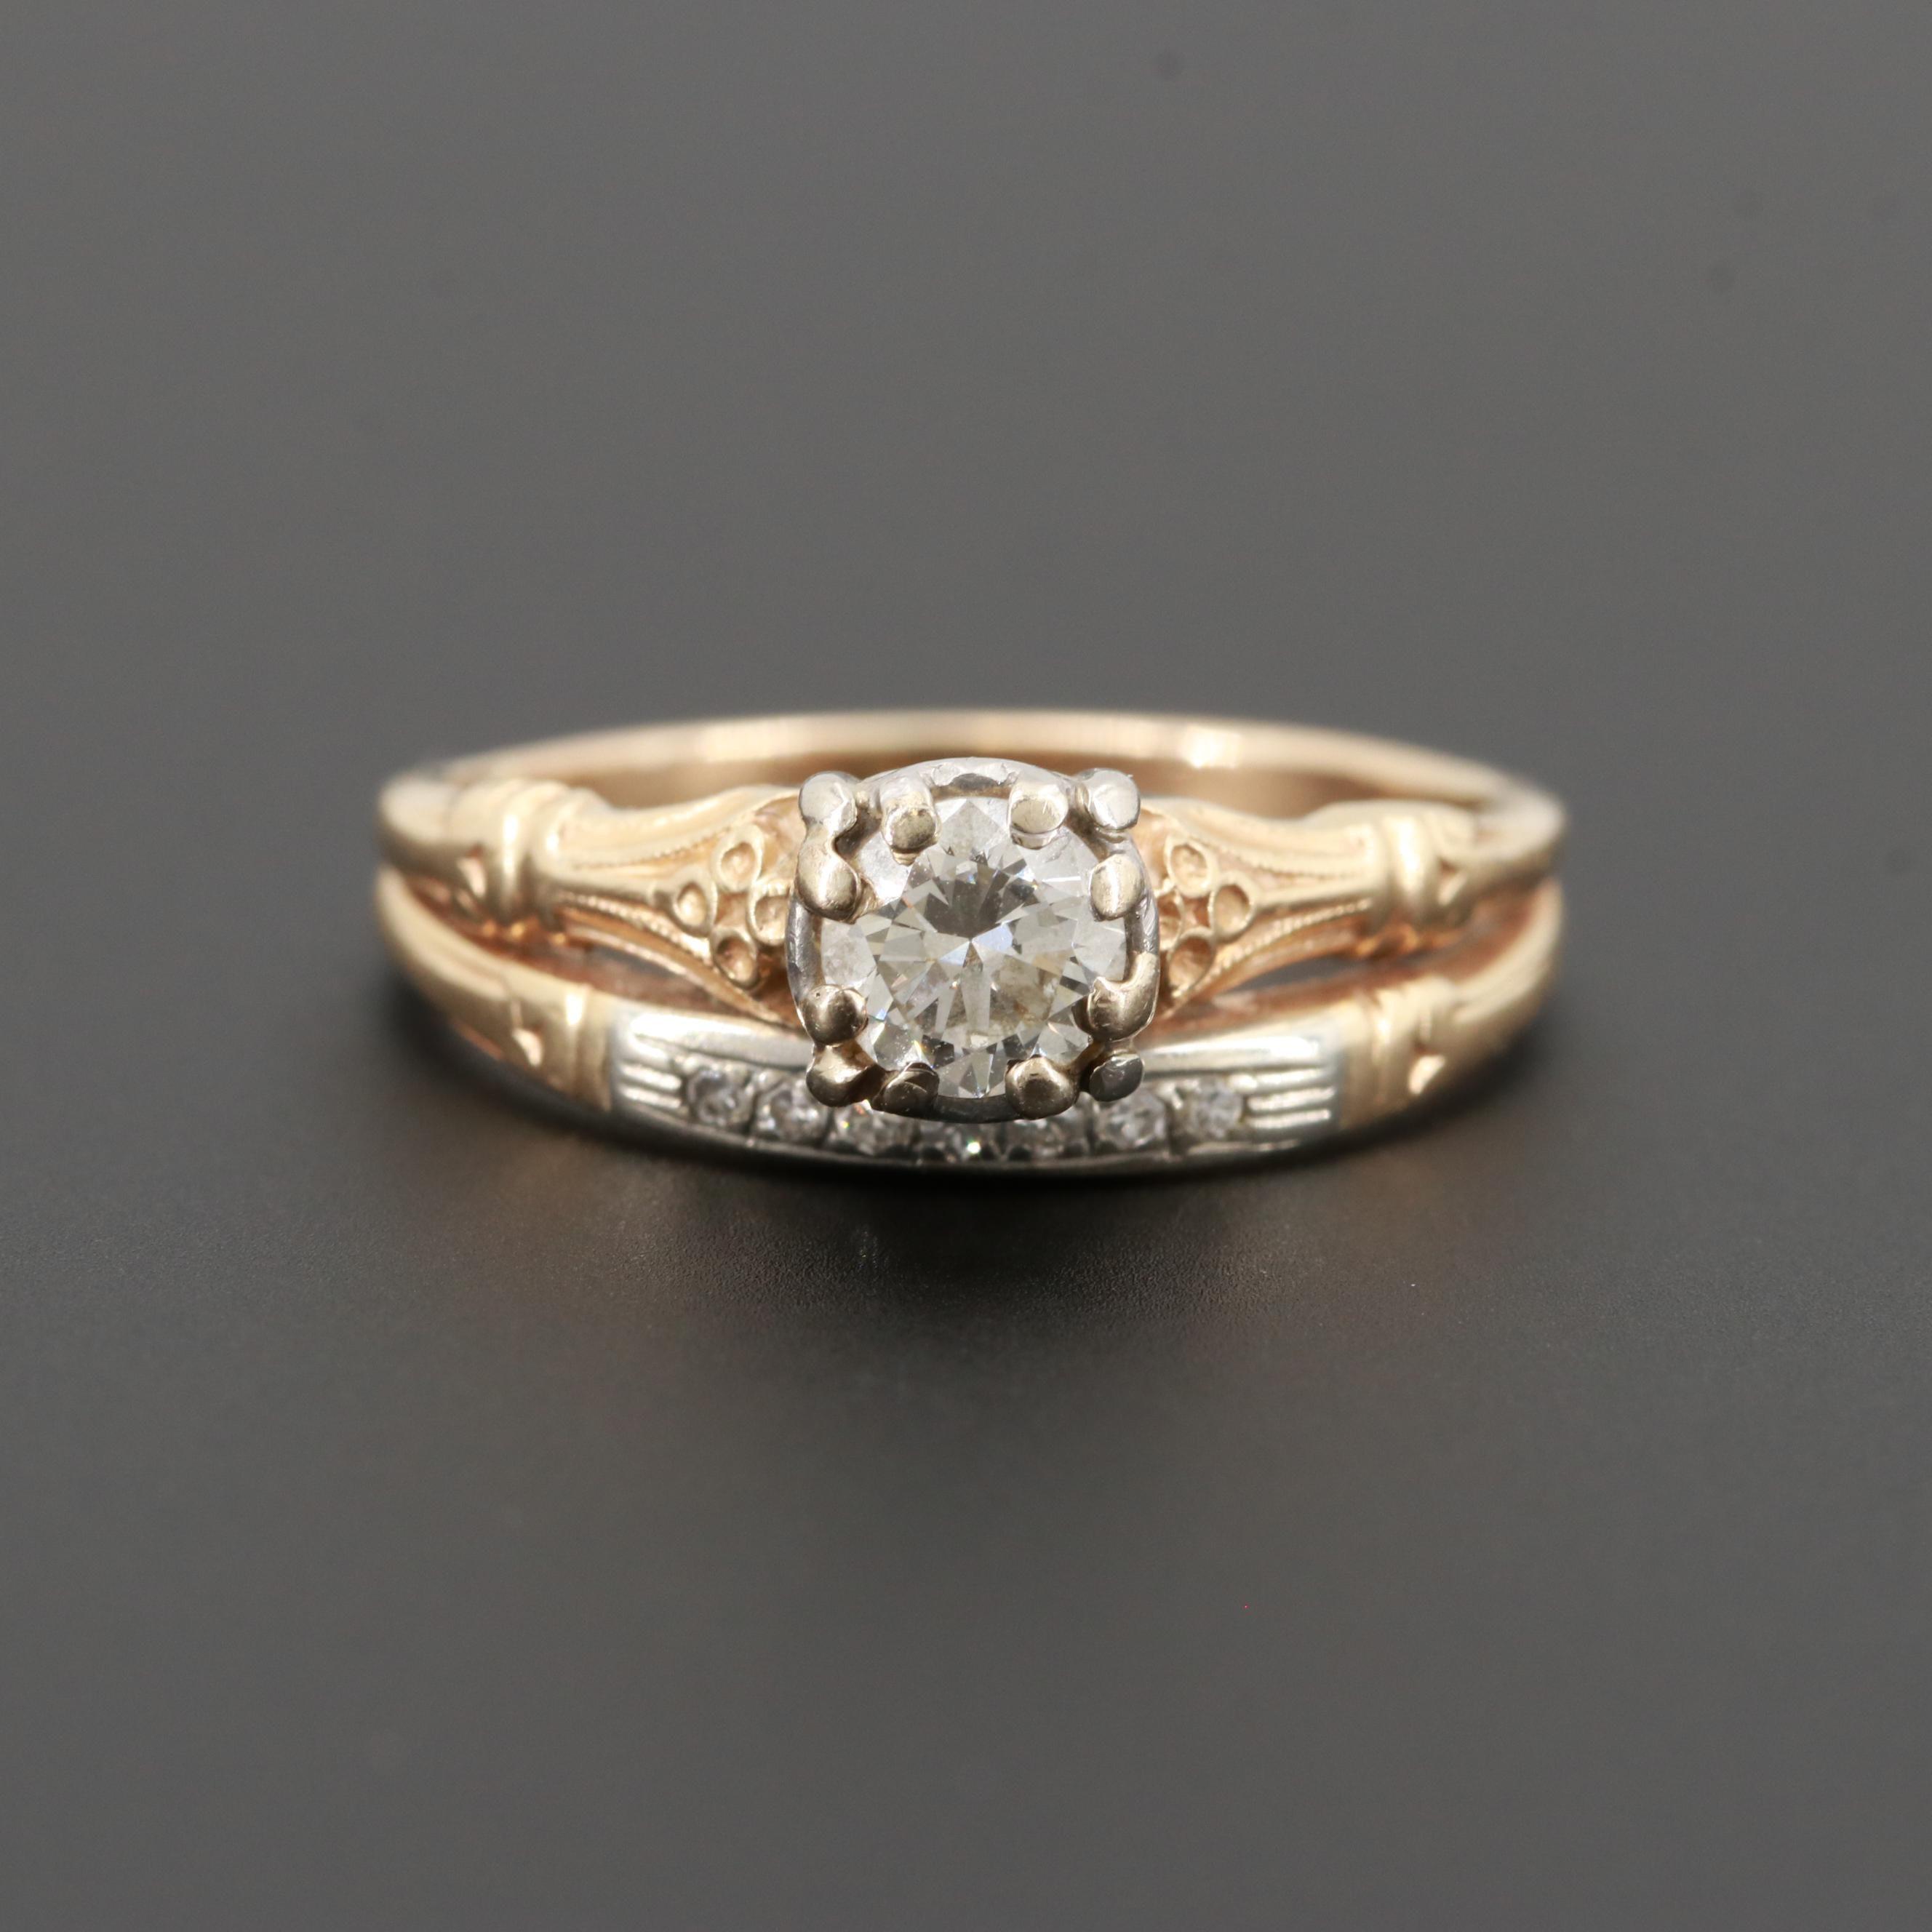 Vintage 14K Yellow Gold and Platinum Diamond Ring